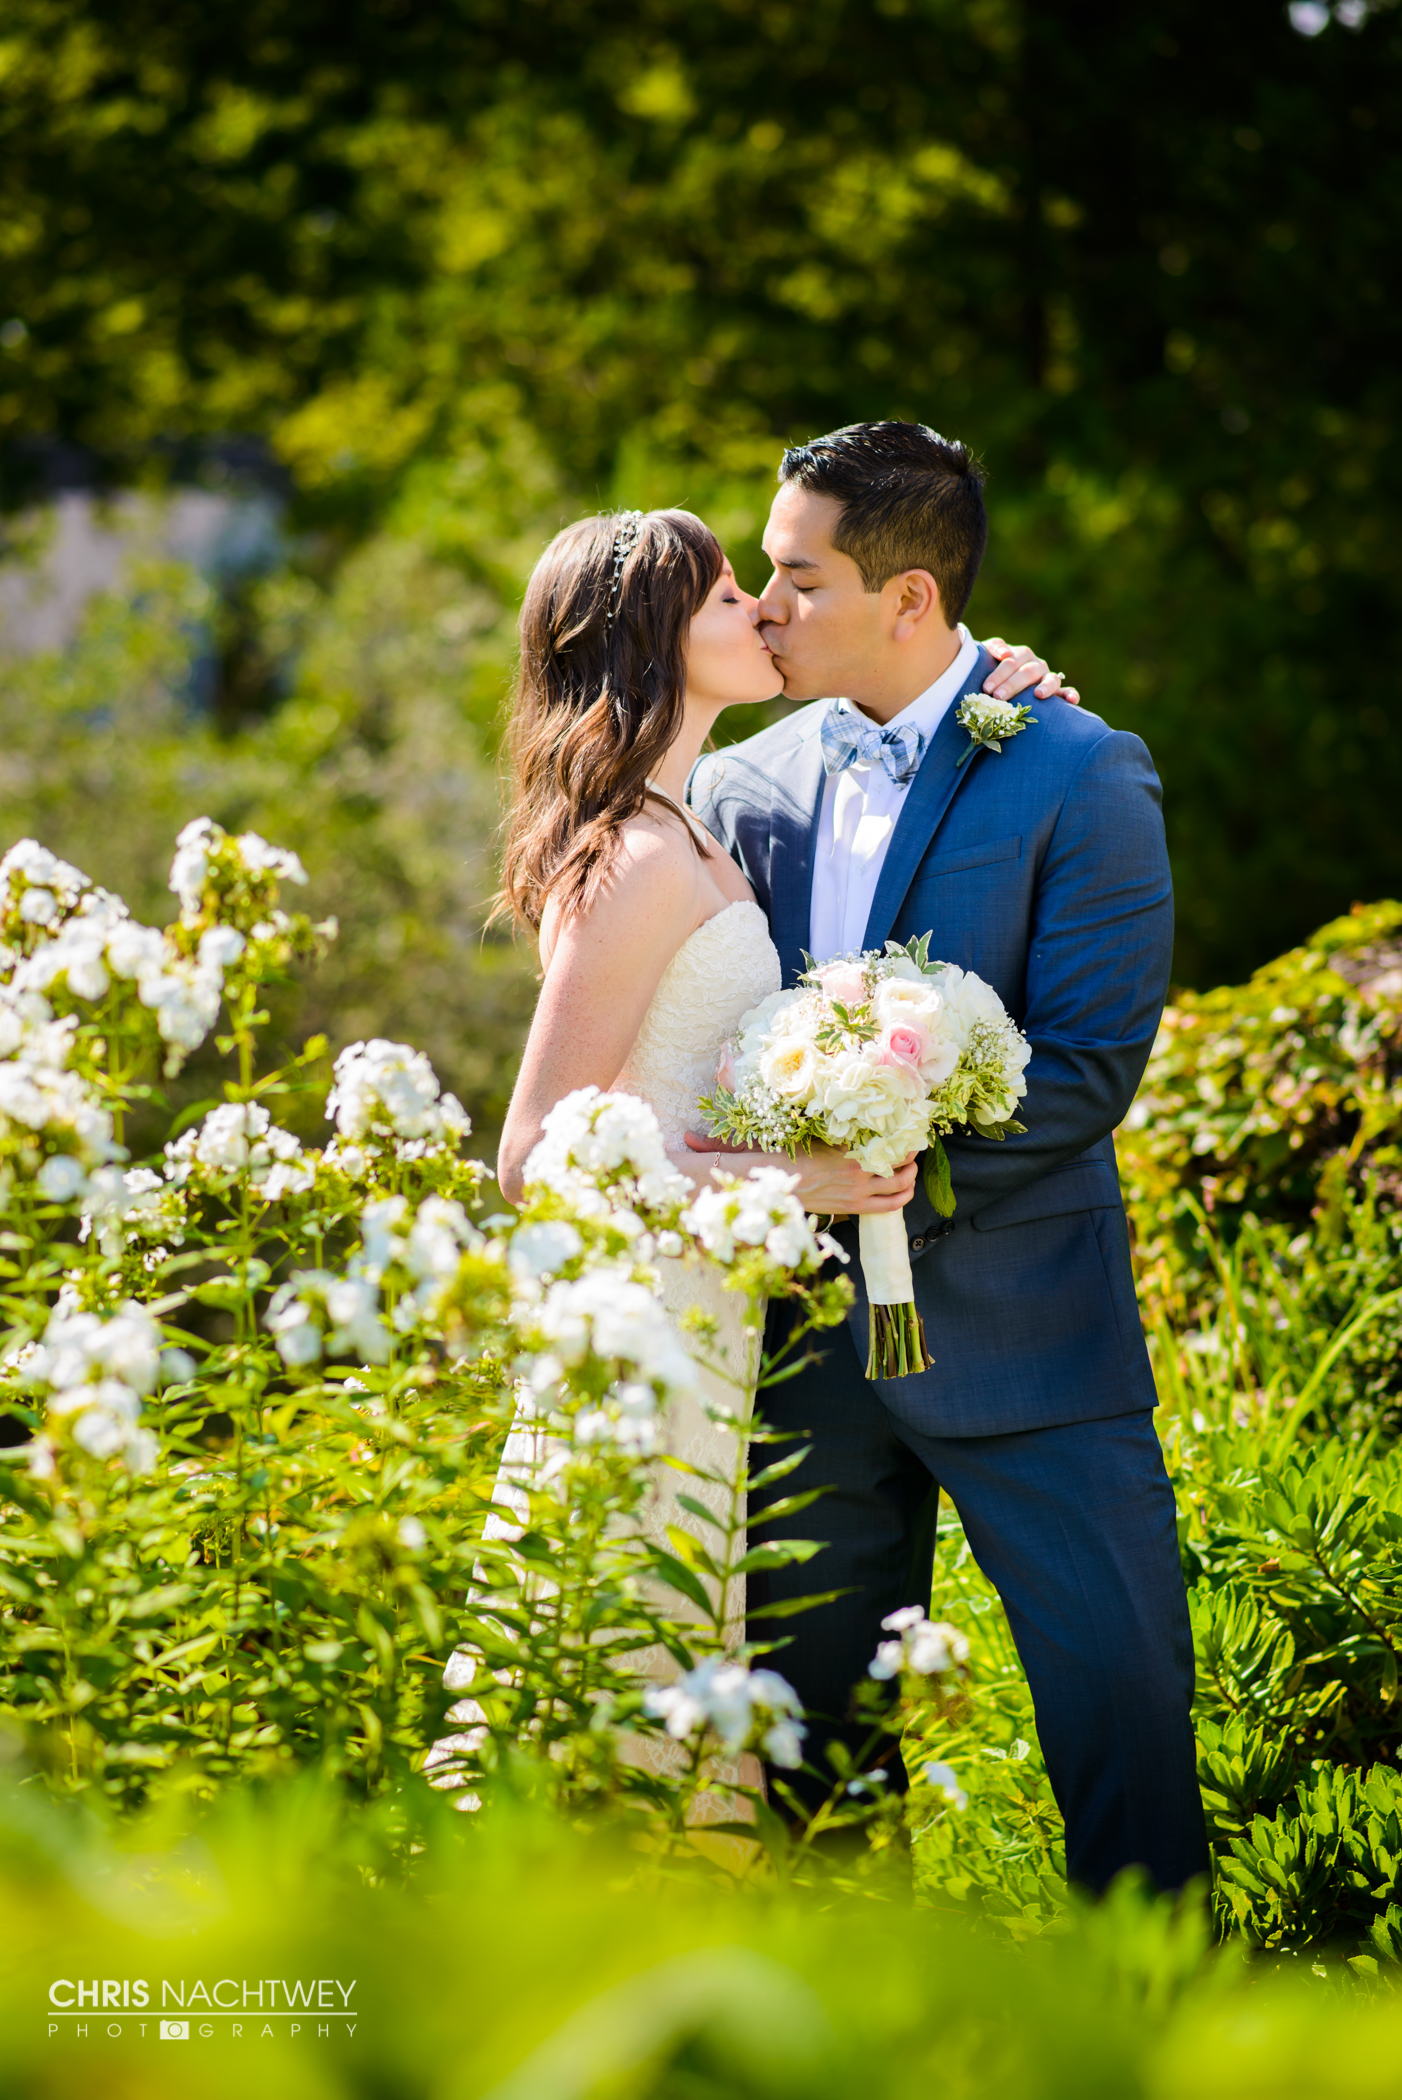 inn-at-mystic-connecticut-wedding-photographer-chris-nachtwey-19.jpg